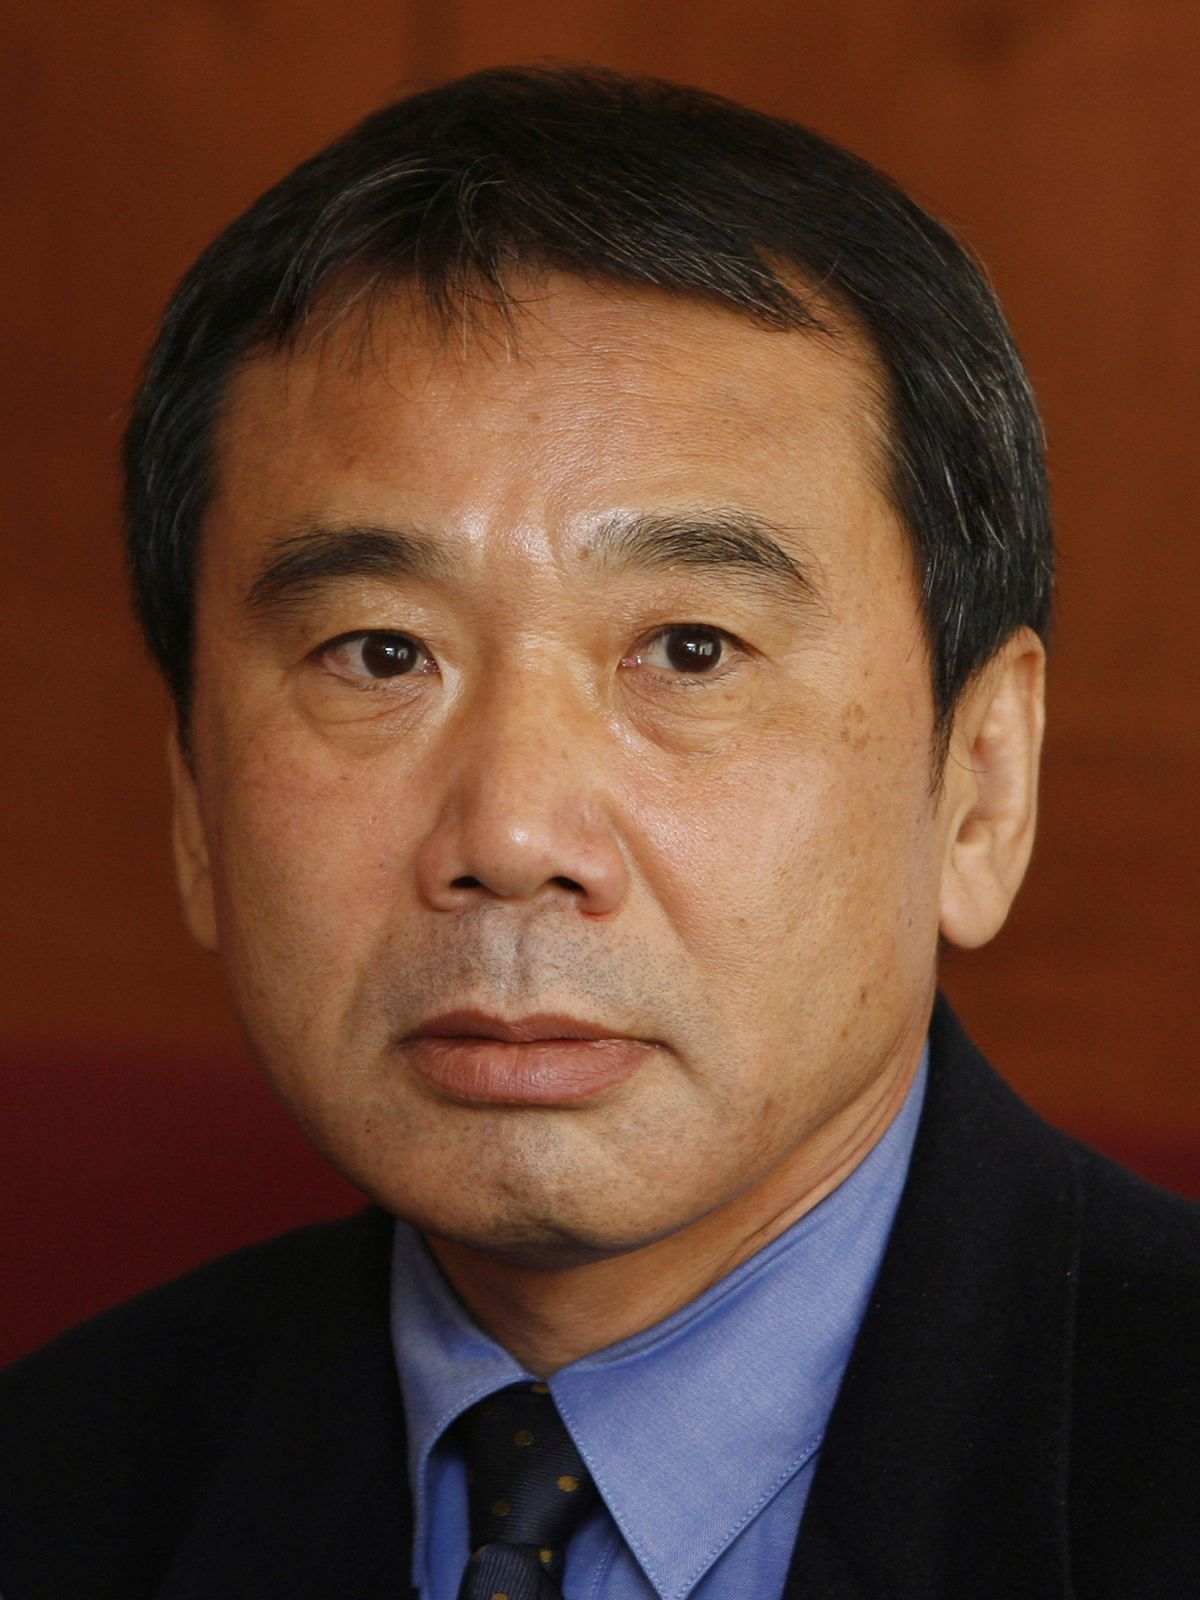 Murakami-sensei, Let's Meet Again!